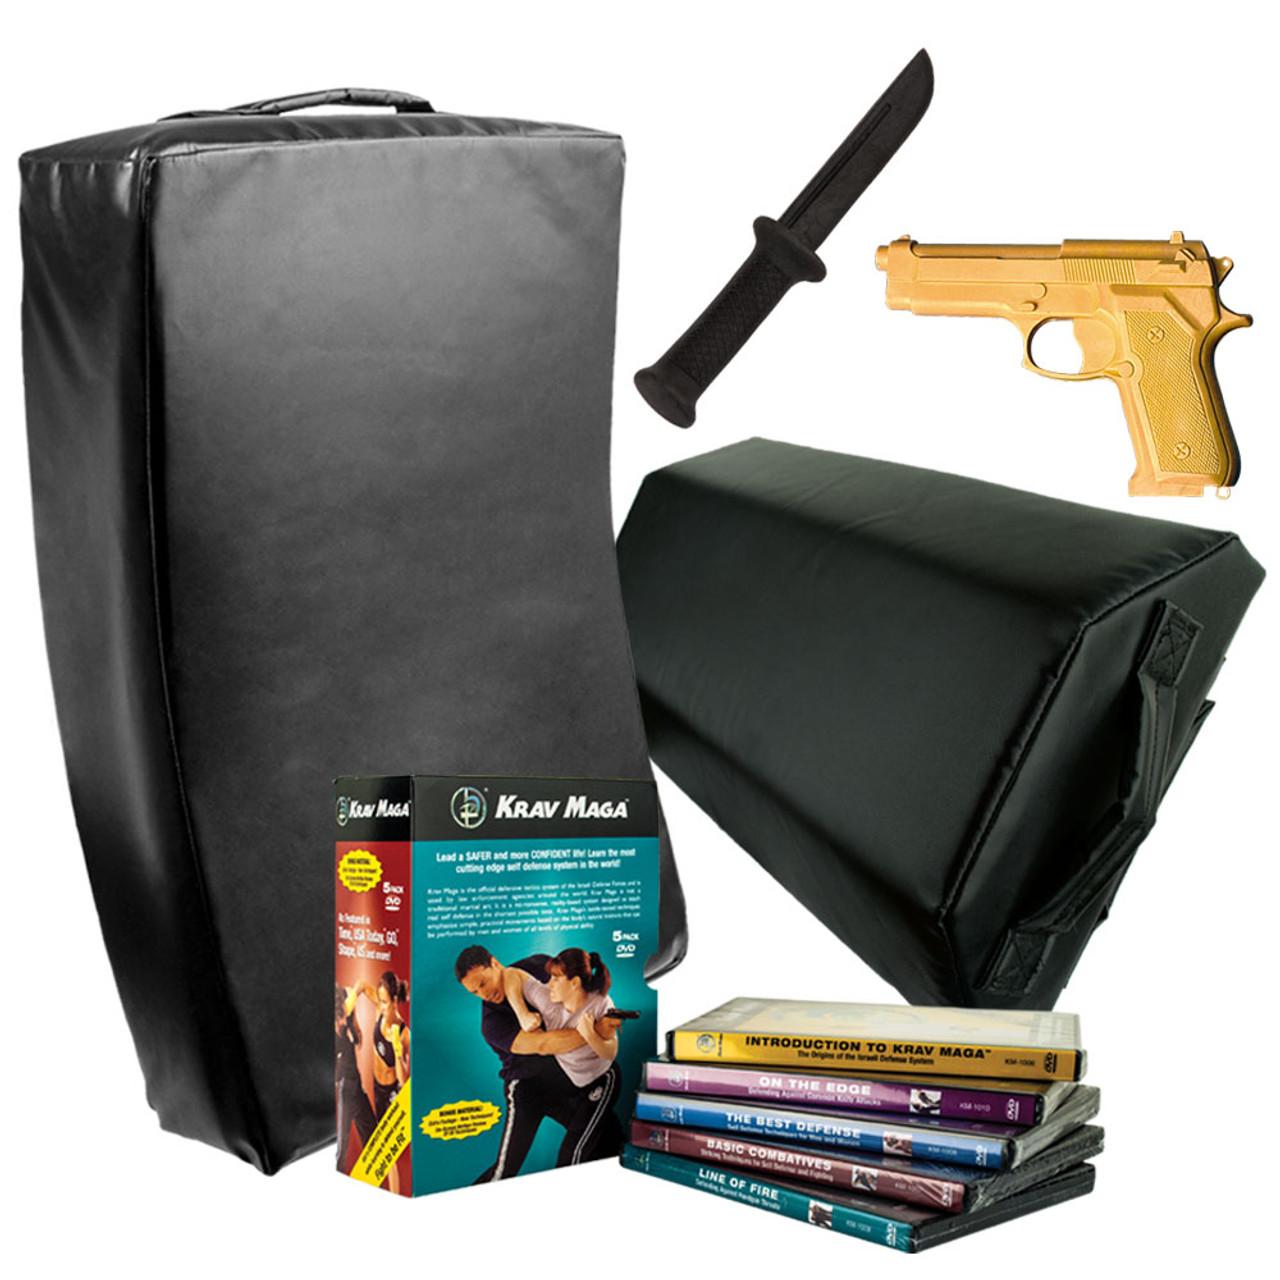 Krav Maga DVD Series and Shield Kit - Includes DVD set, Shields, Training Knife and Training Gun -Free Shipping